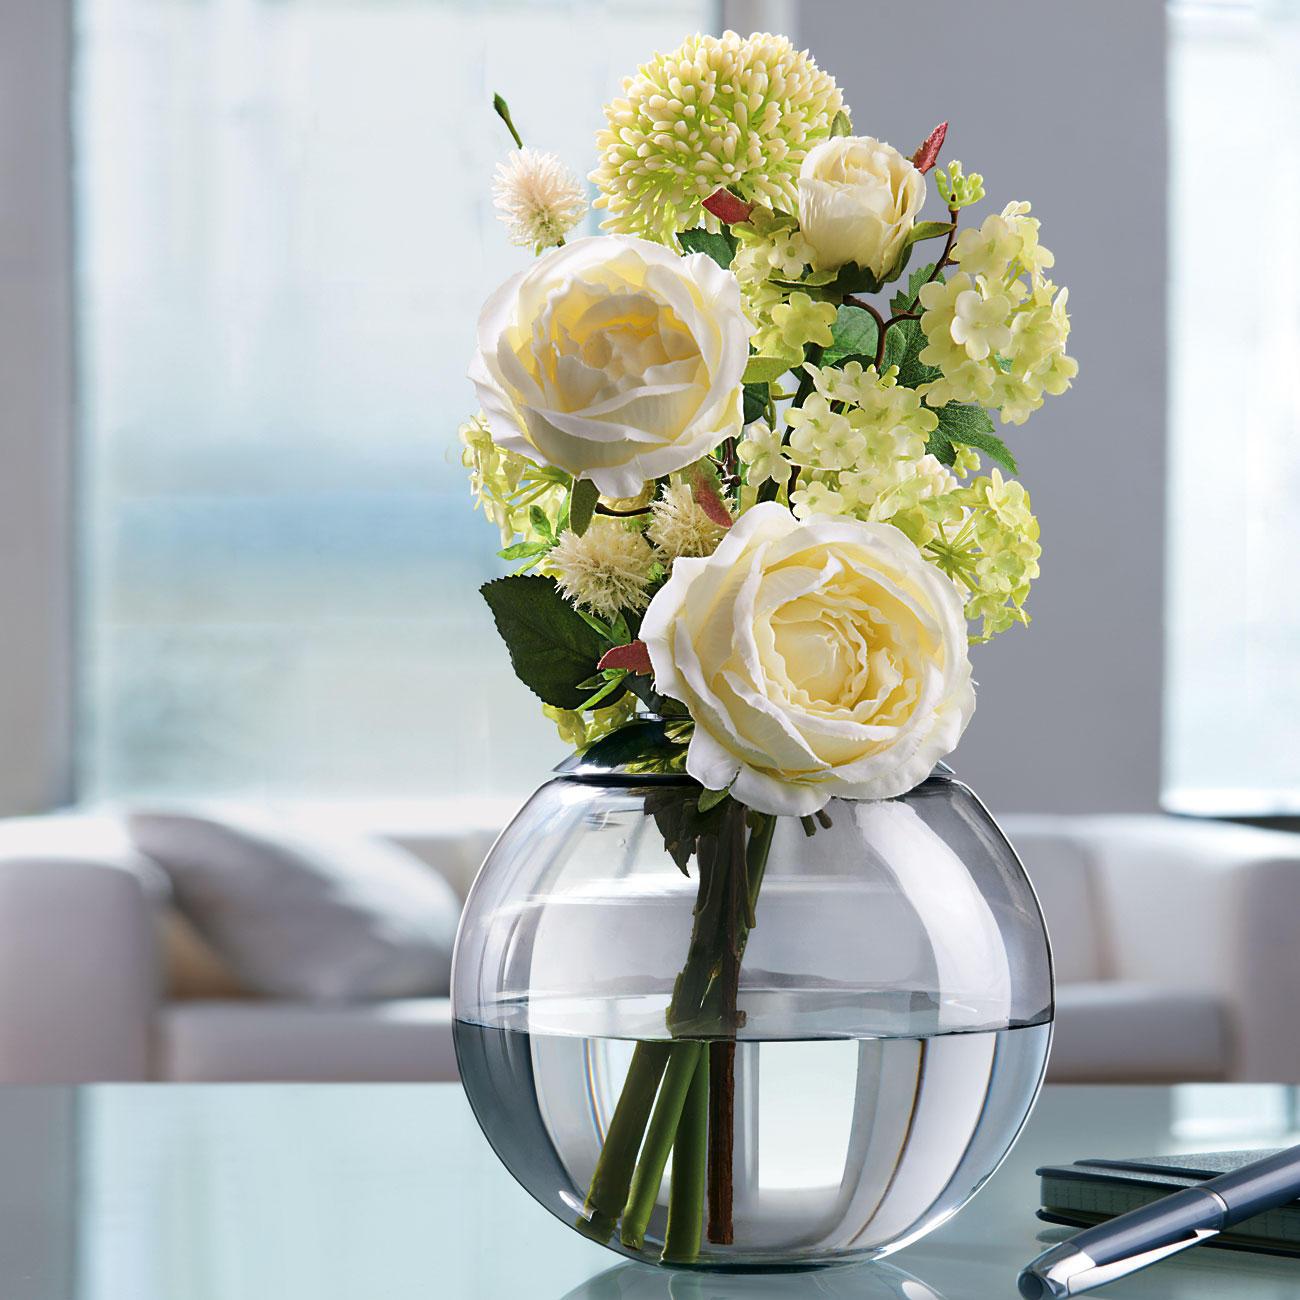 Lieblings Variable Blumenvase | 3 Jahre Garantie | Pro-Idee @ES_36